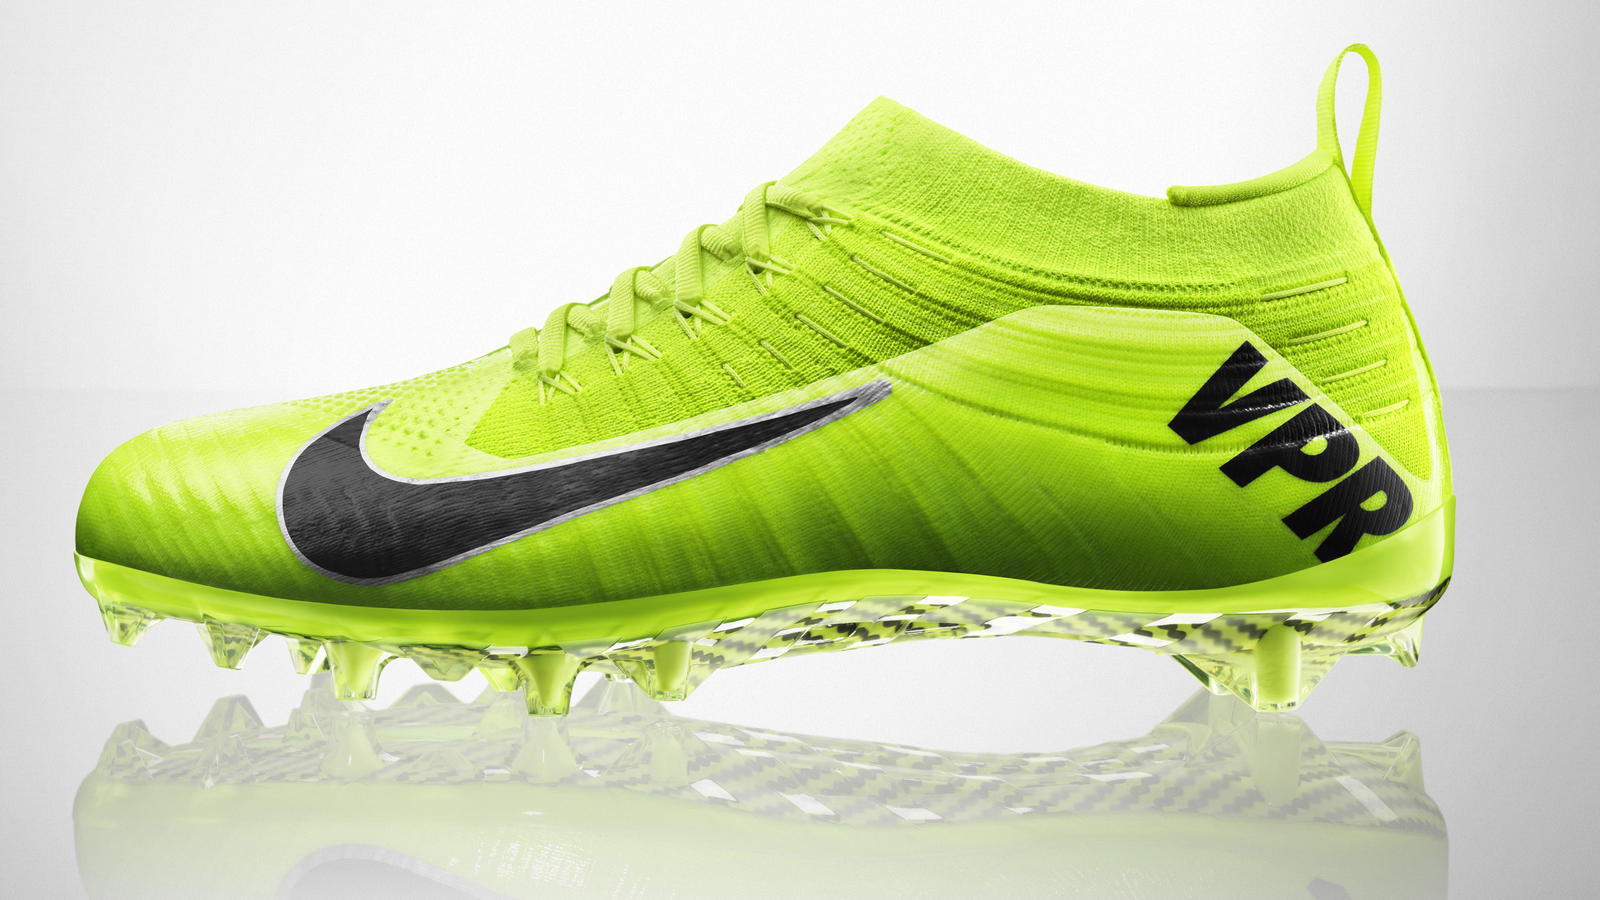 Nike Vapor Ultimate Cleat